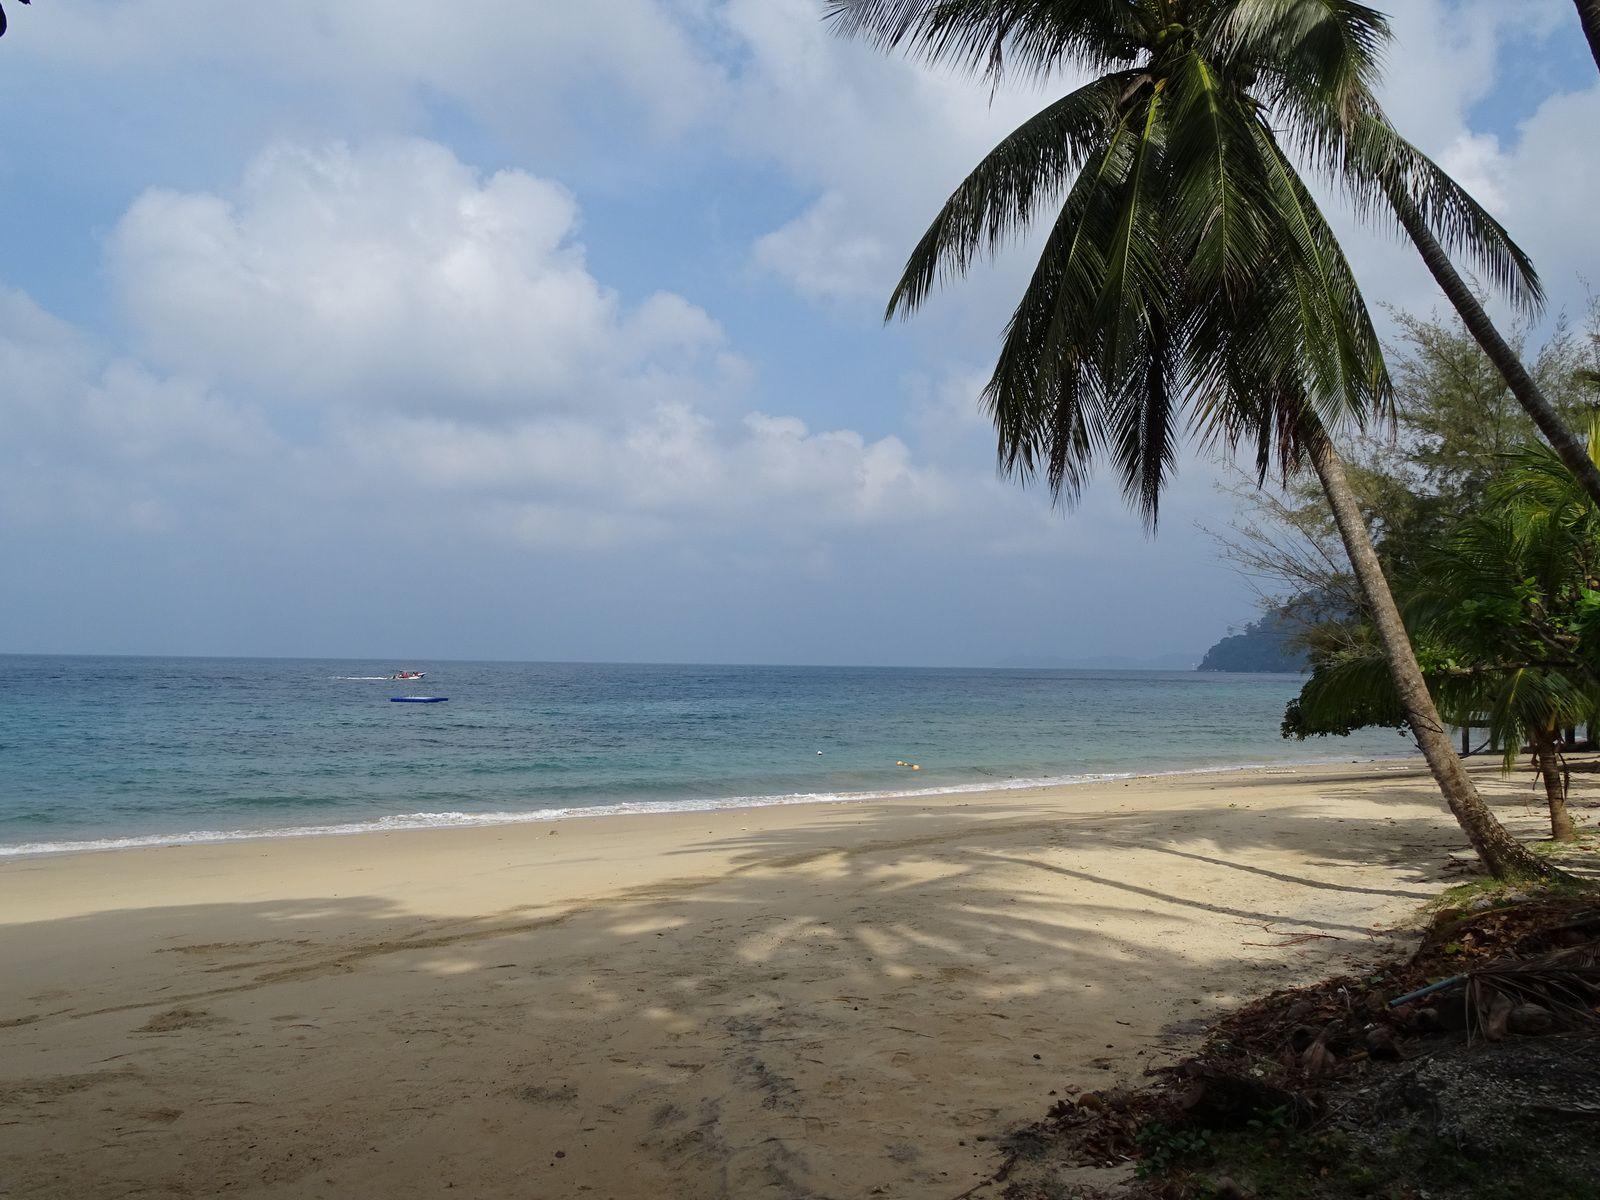 Voyage en MALAISIE  Janvier/Février 2020 Malacca . Ile Tioman